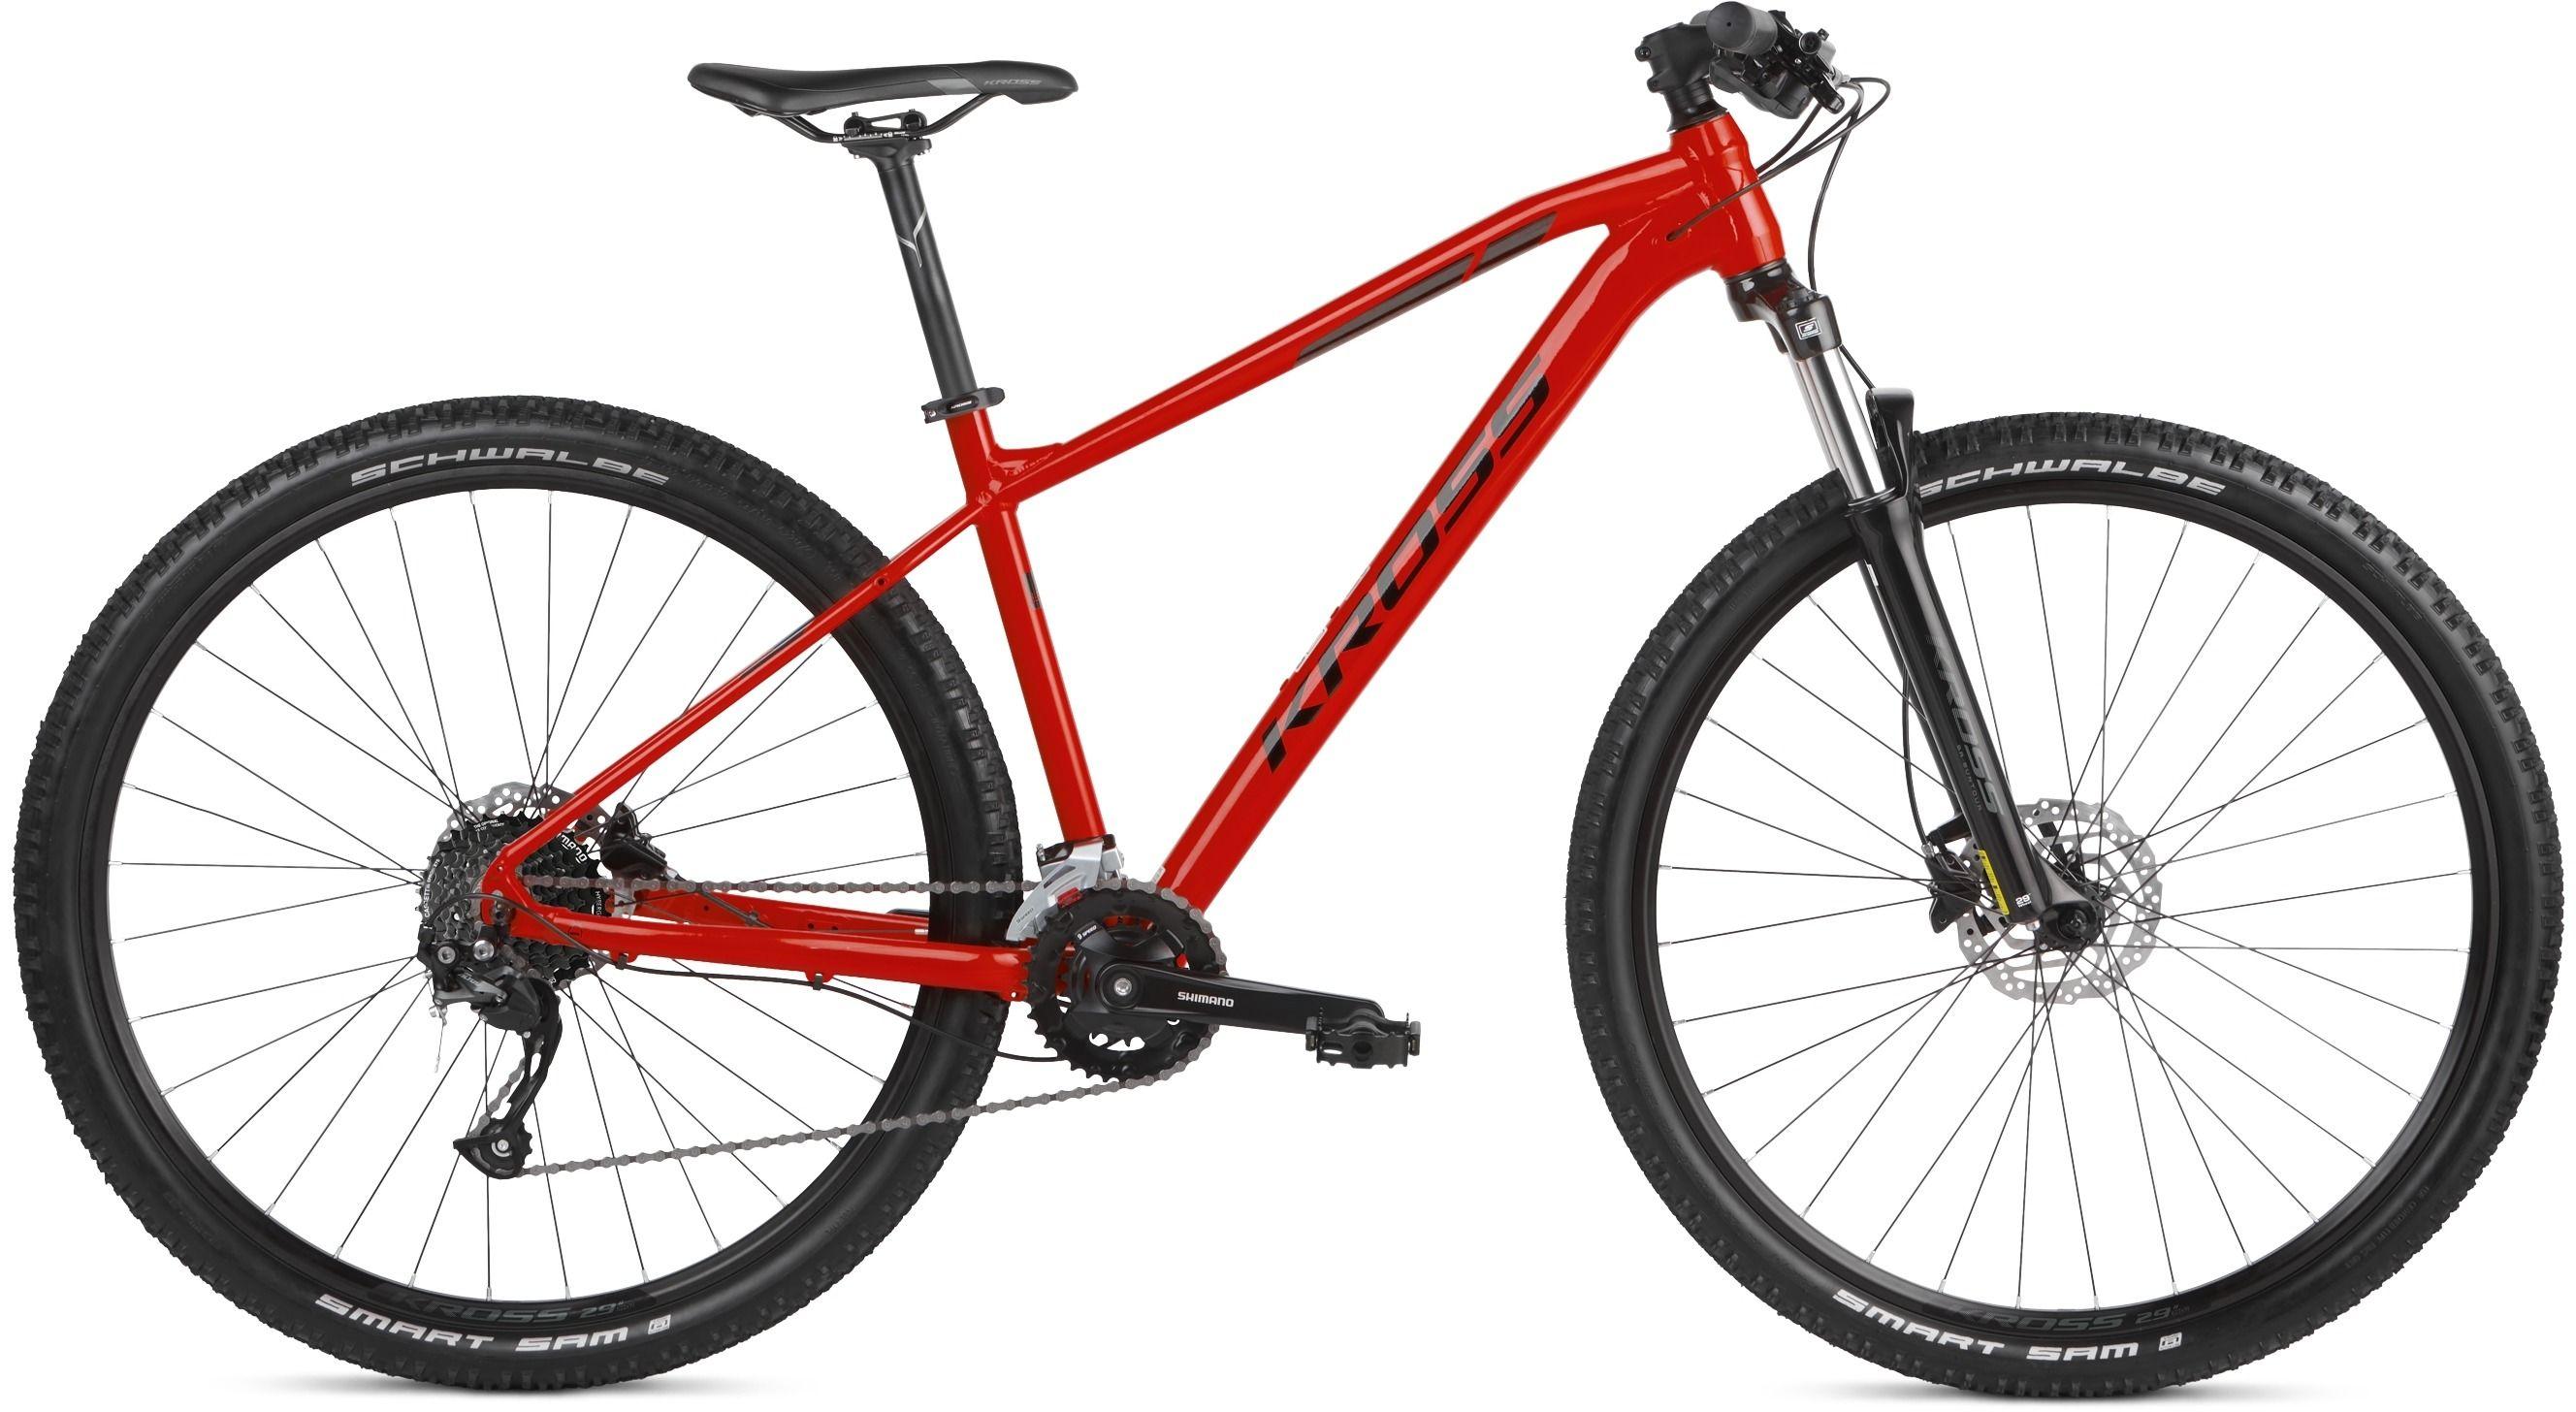 "Rower Kross LEVEL 1.0 SR 21 czerwony 29"" 2021"